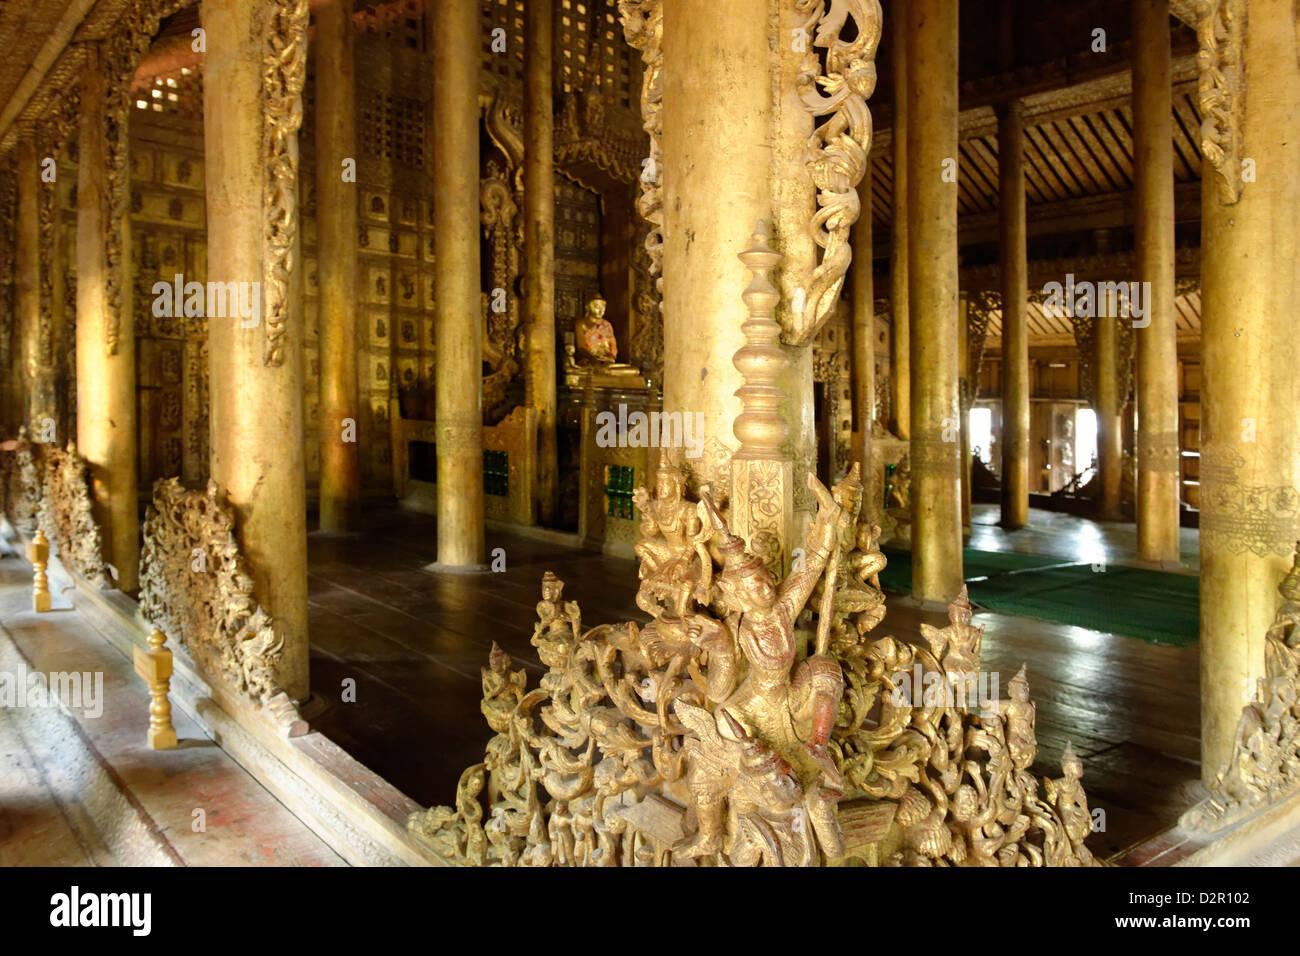 Shwenandaw Monastery, located near Mandalay Hill, Mandalay, Mandalay Division, Myanmar - Stock Image